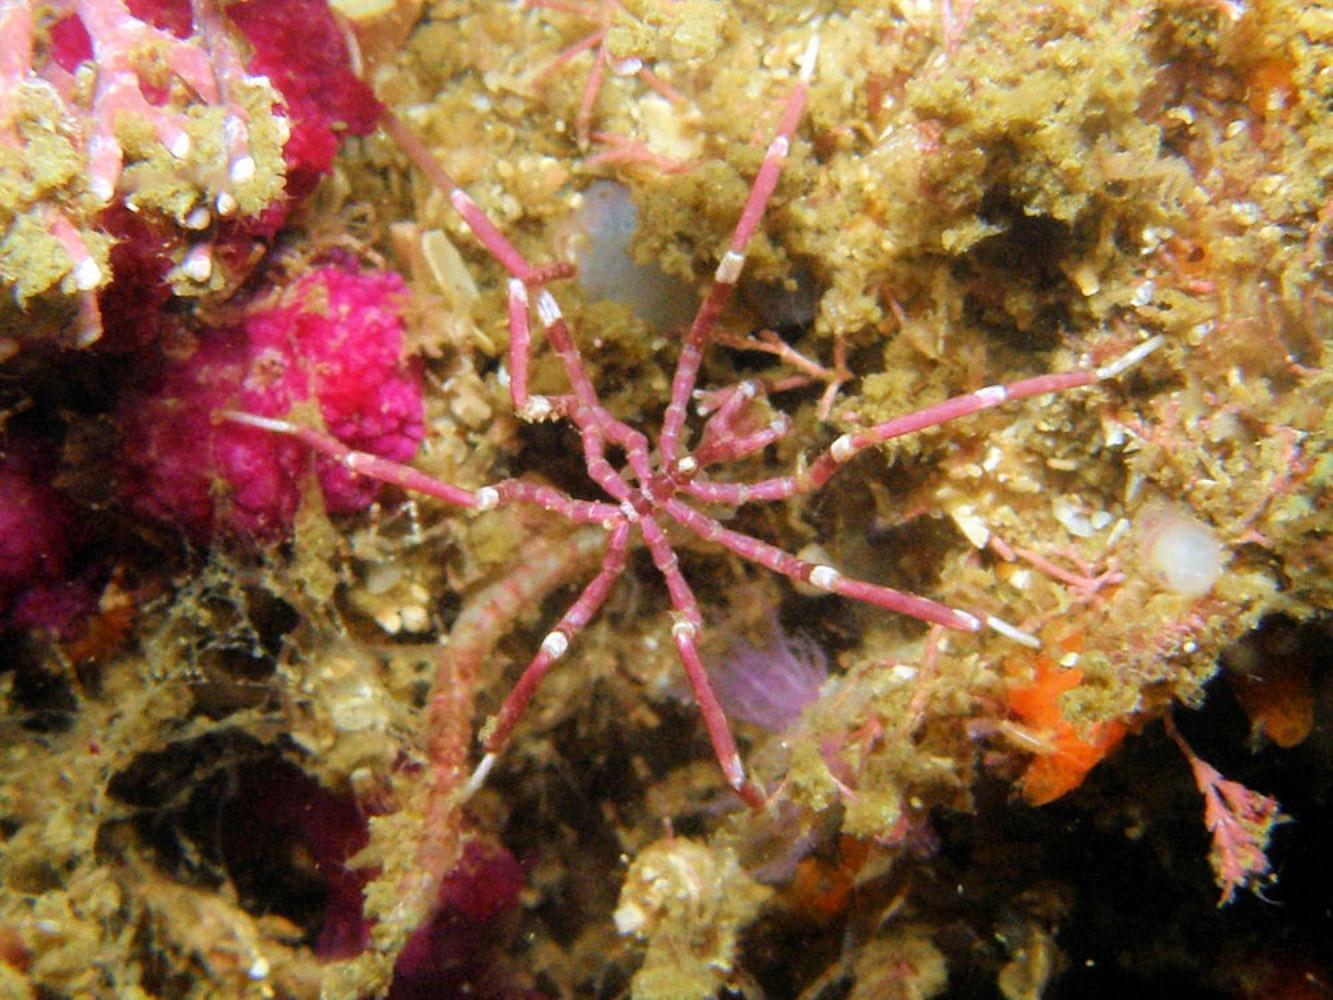 Scarlet sea spider